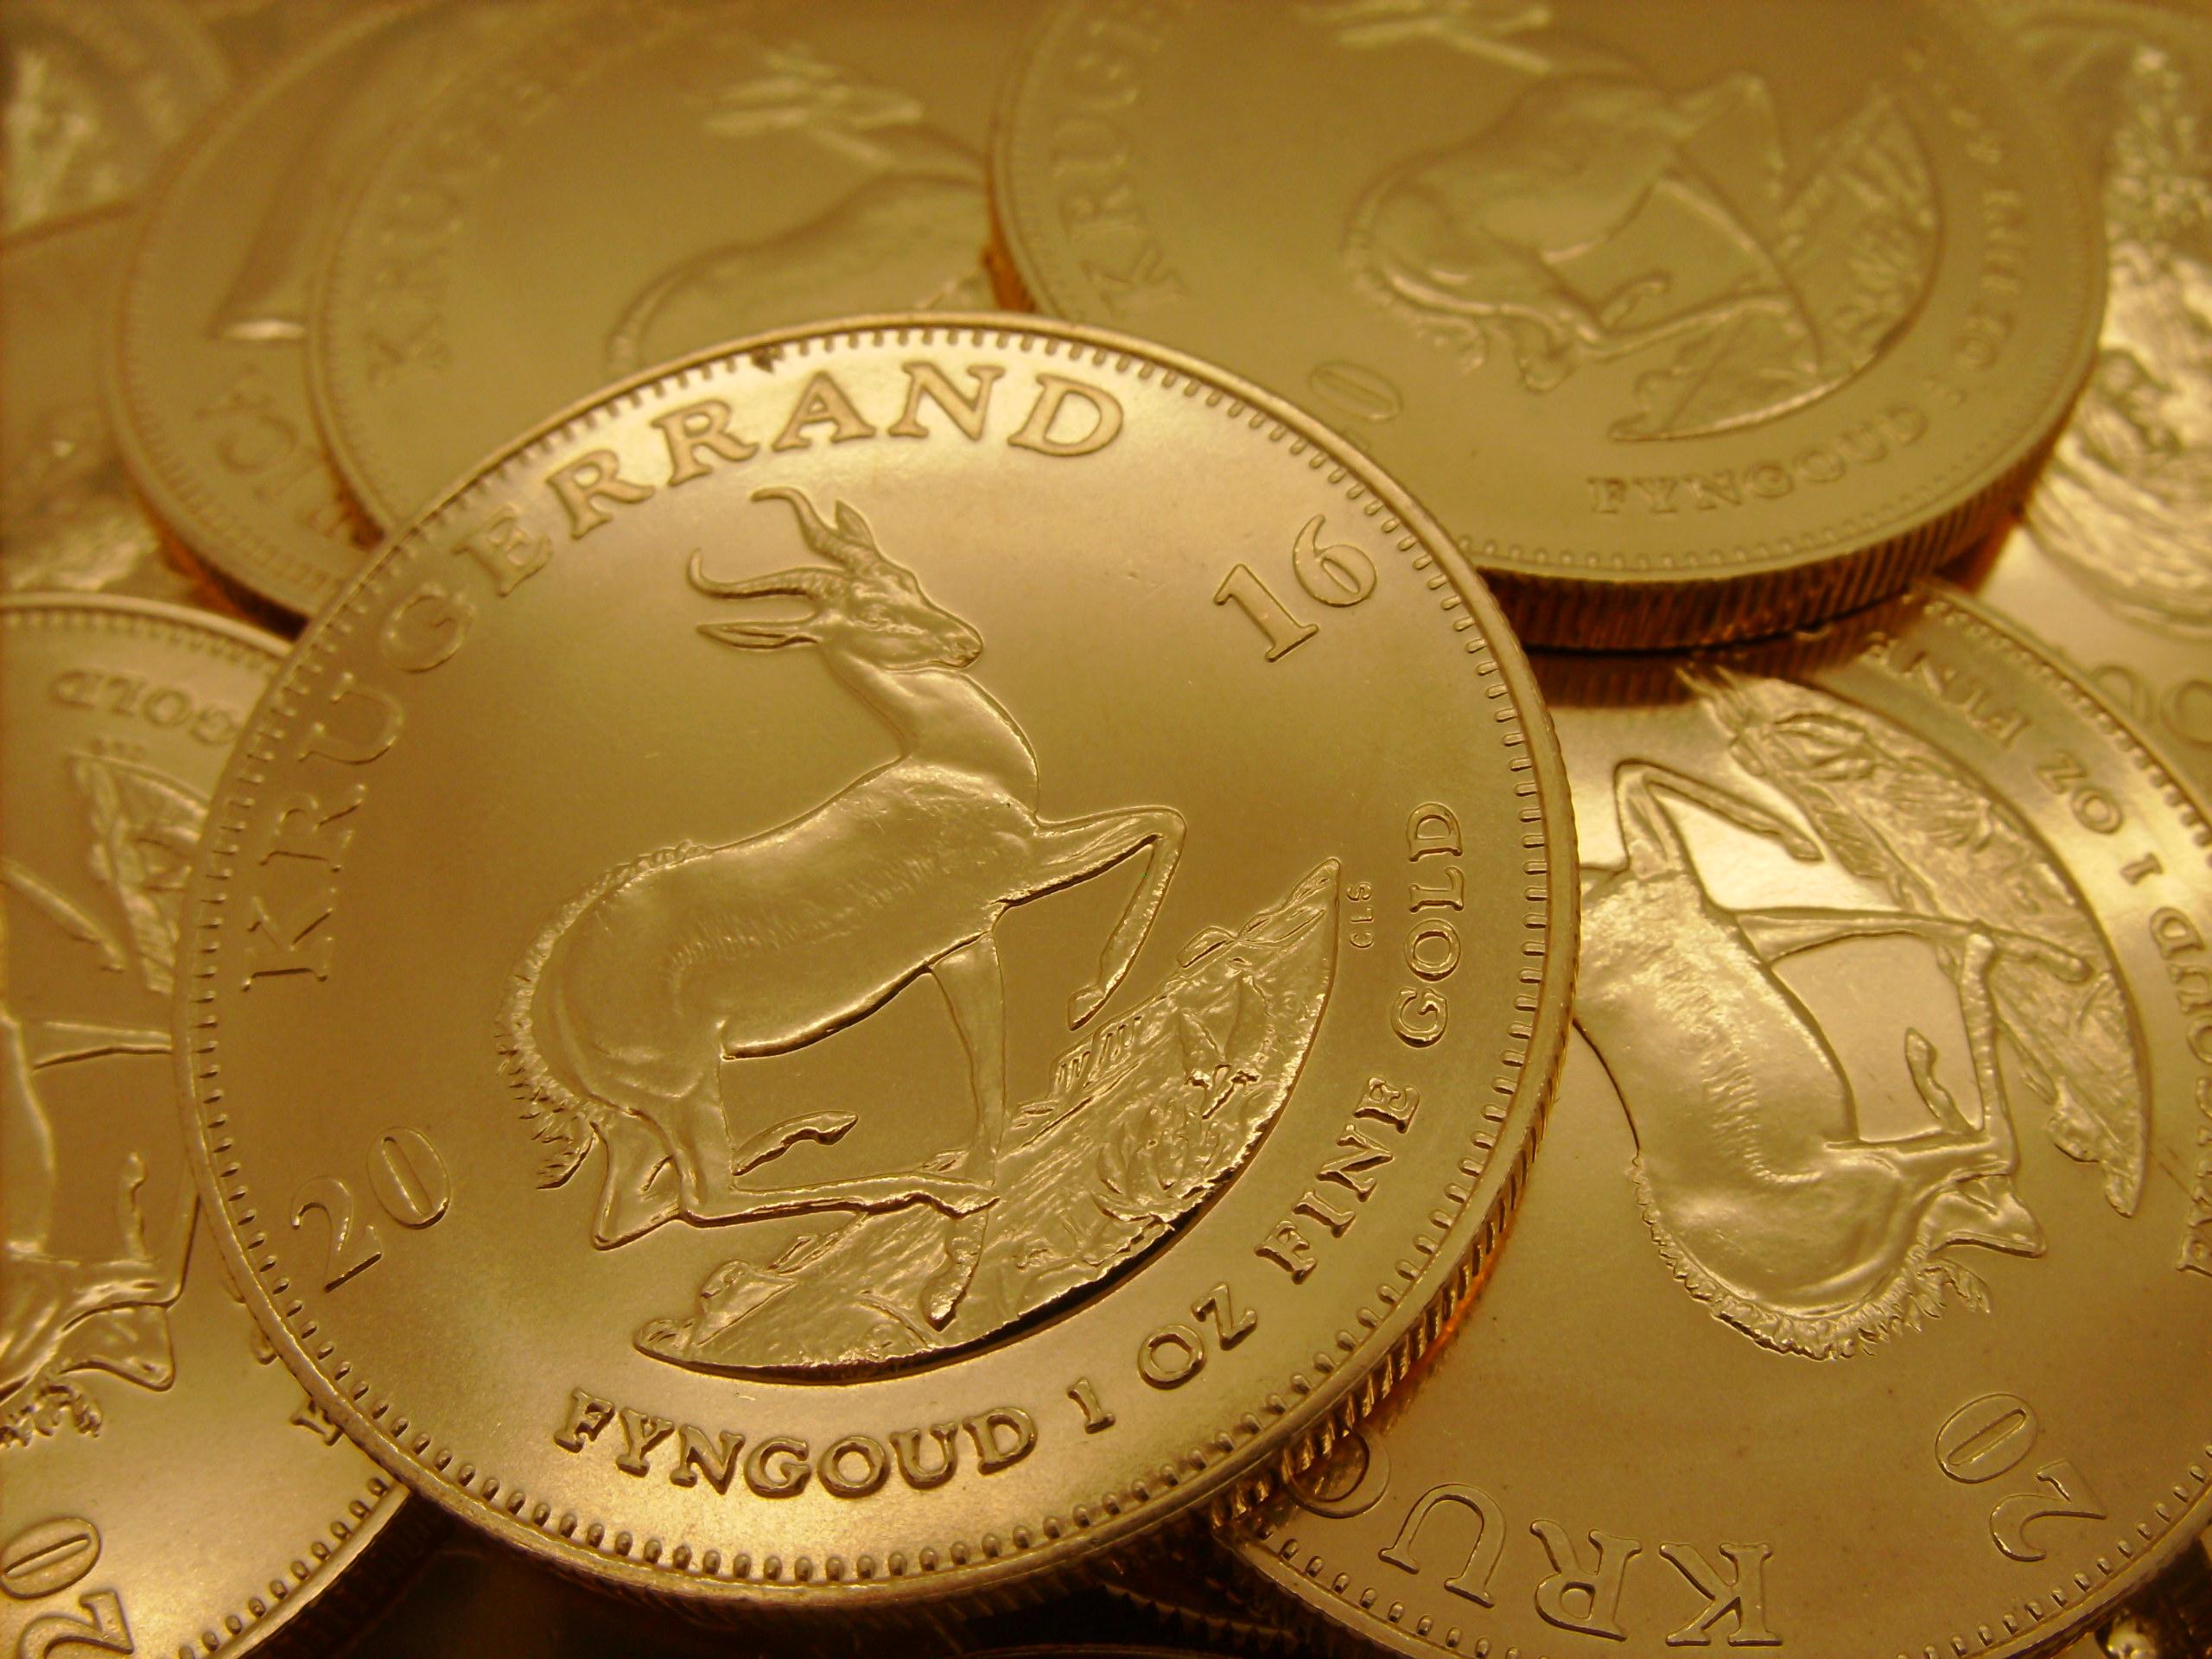 Krügerrand Goldmünzen kaufen populär